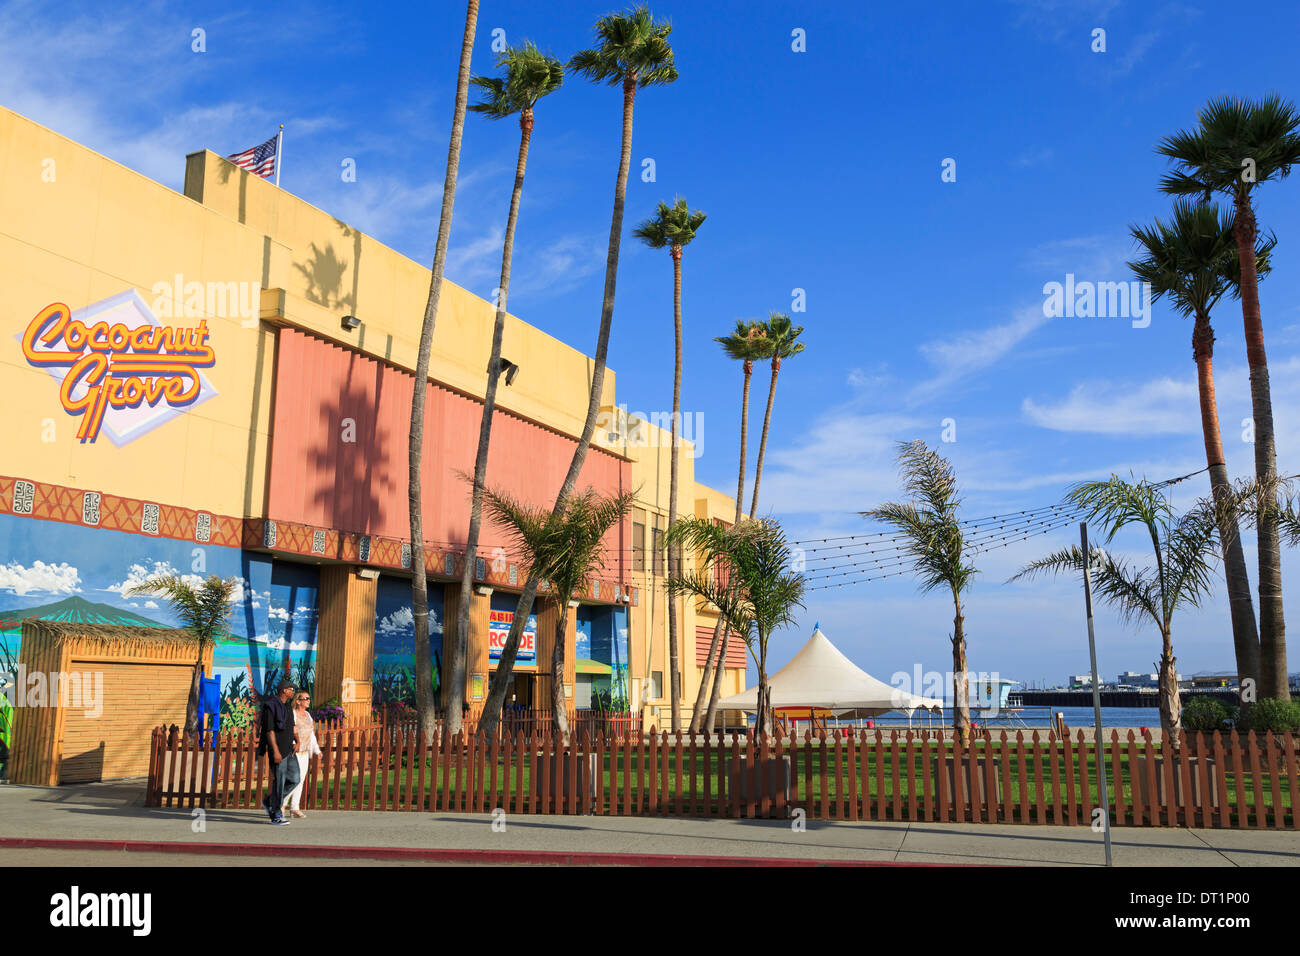 Boardwalk Arcade, Santa Cruz, California, United States of America, North America - Stock Image